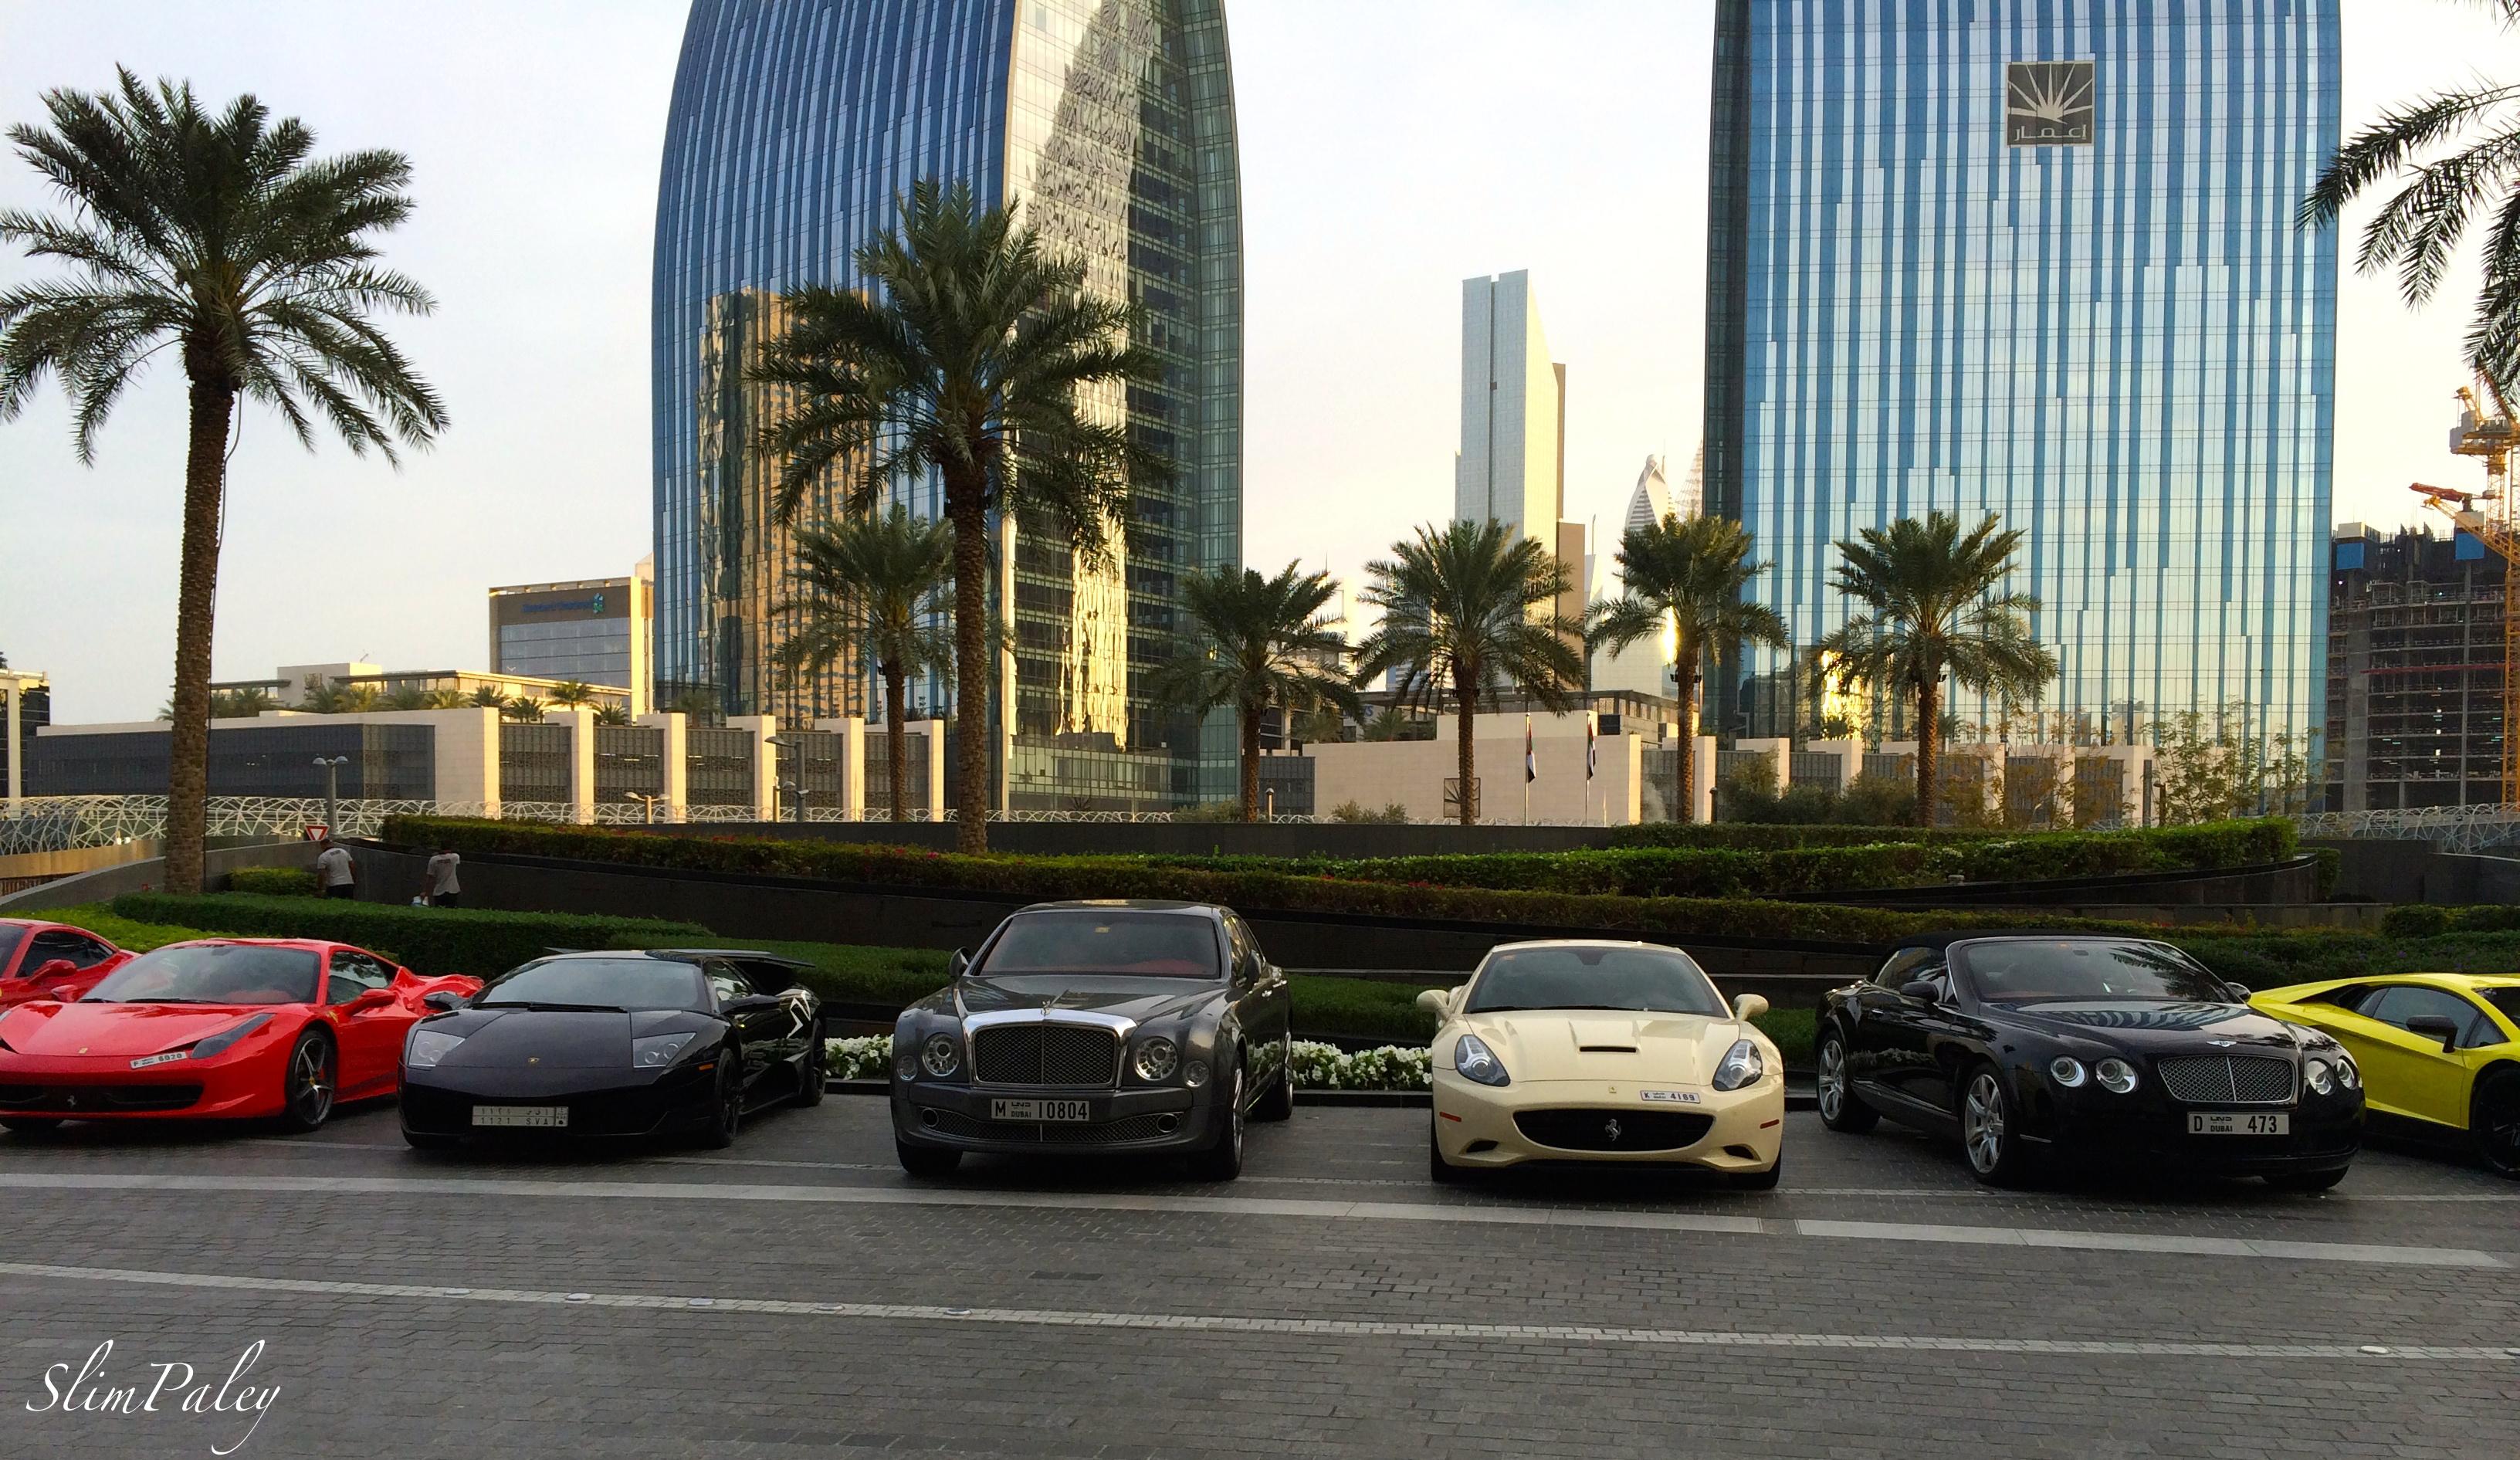 luxurycars.slimpaley.com